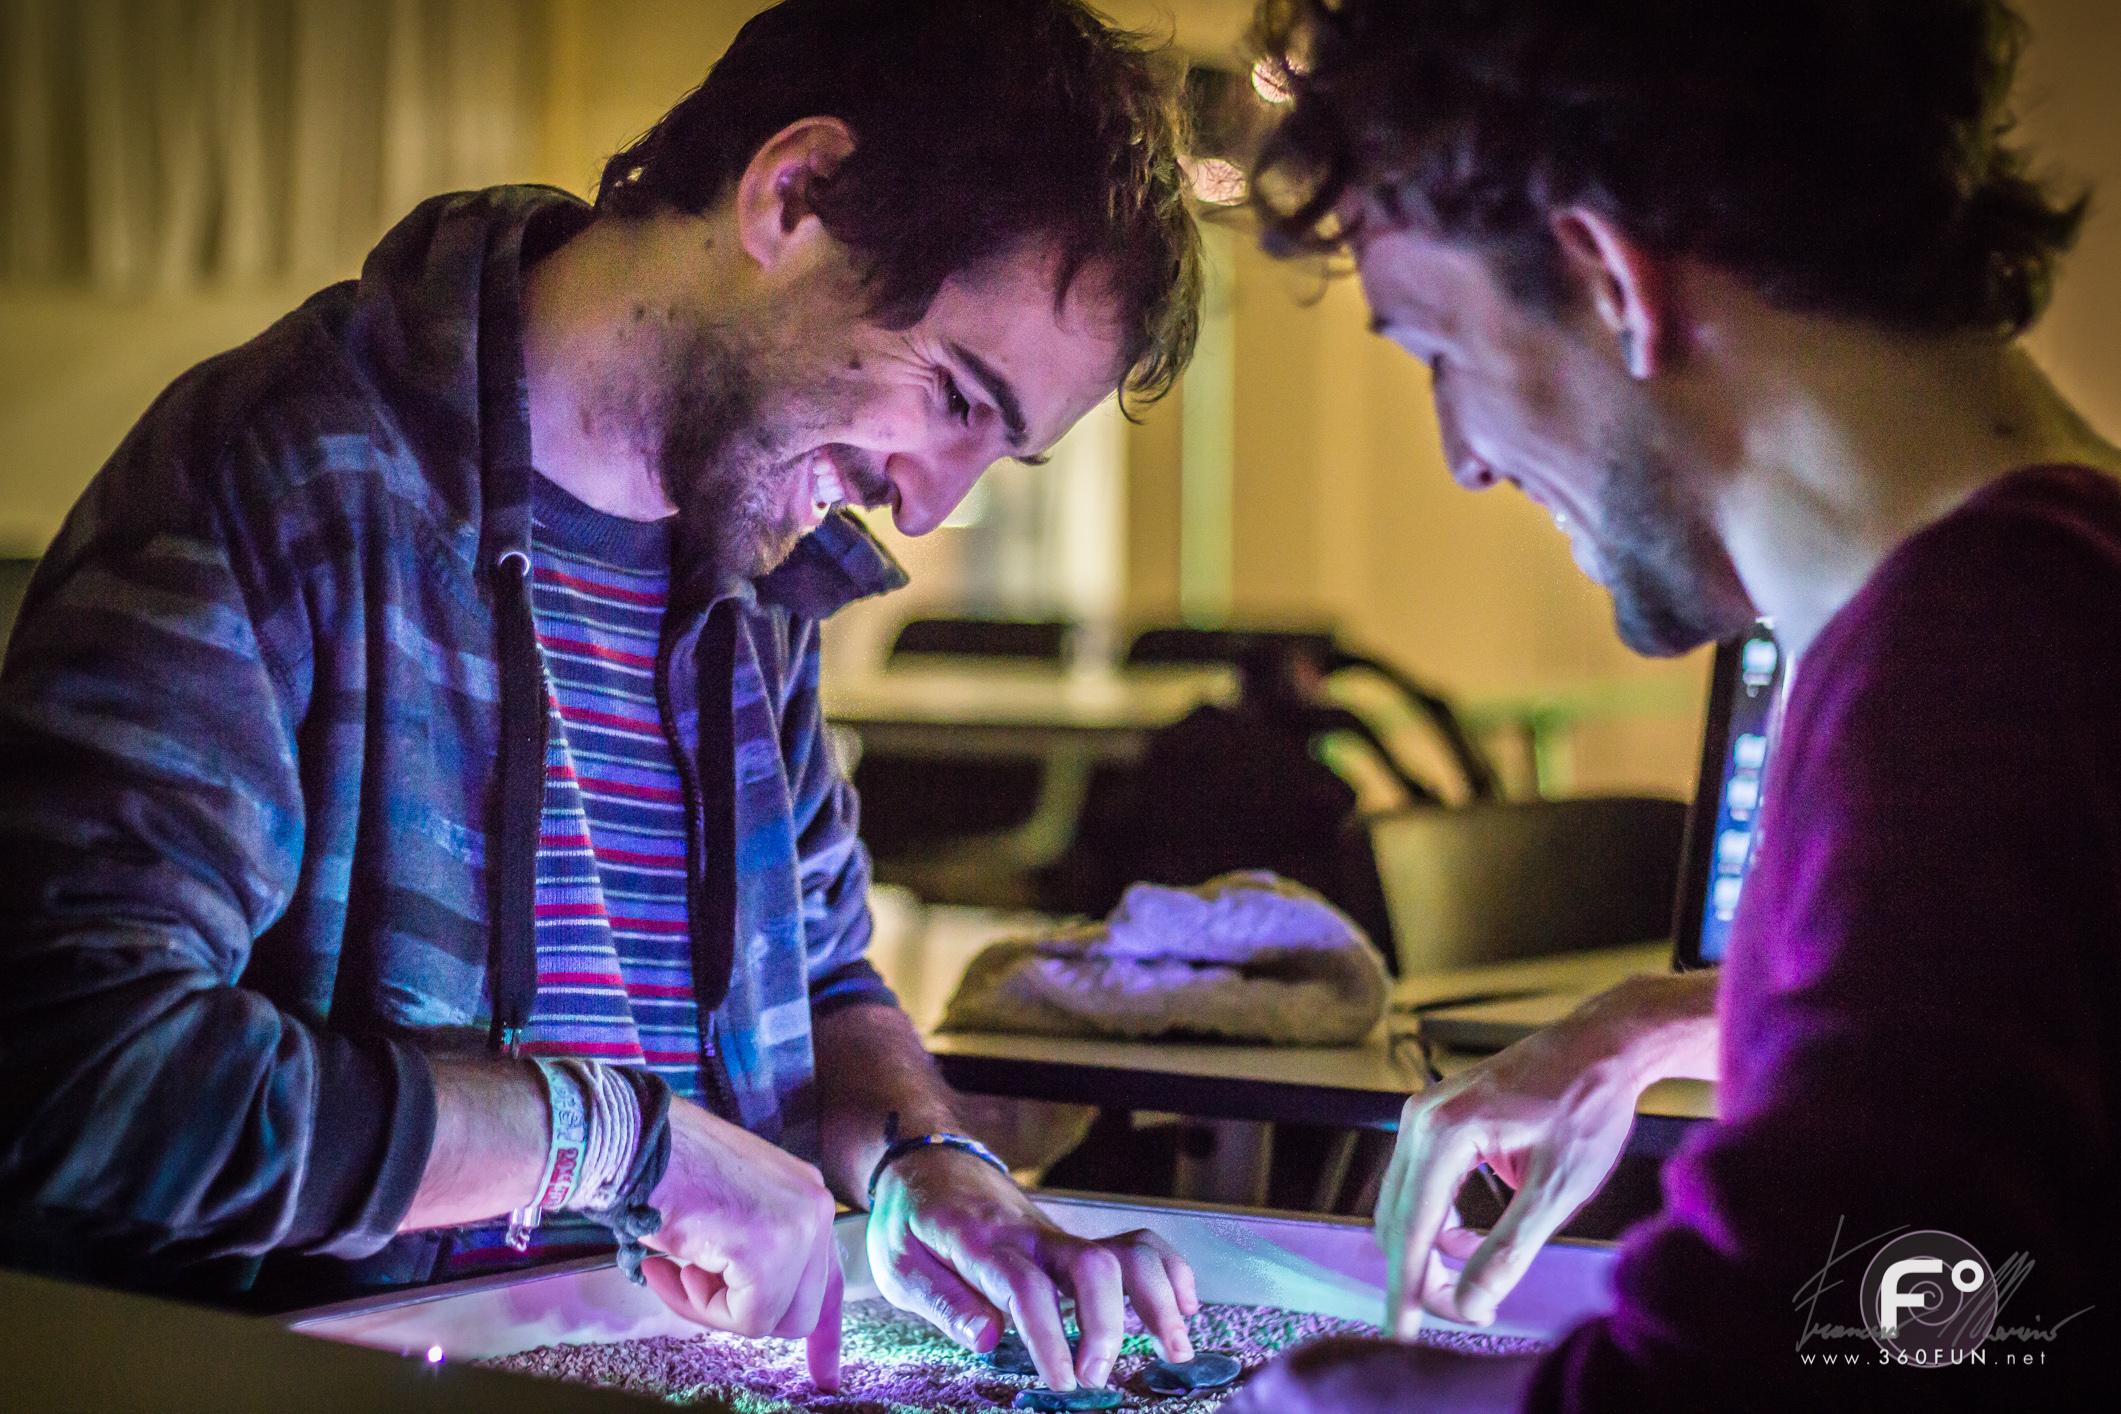 smiling sense shifting madinteraction emotiorama biofeedback biosensor interactive art installation